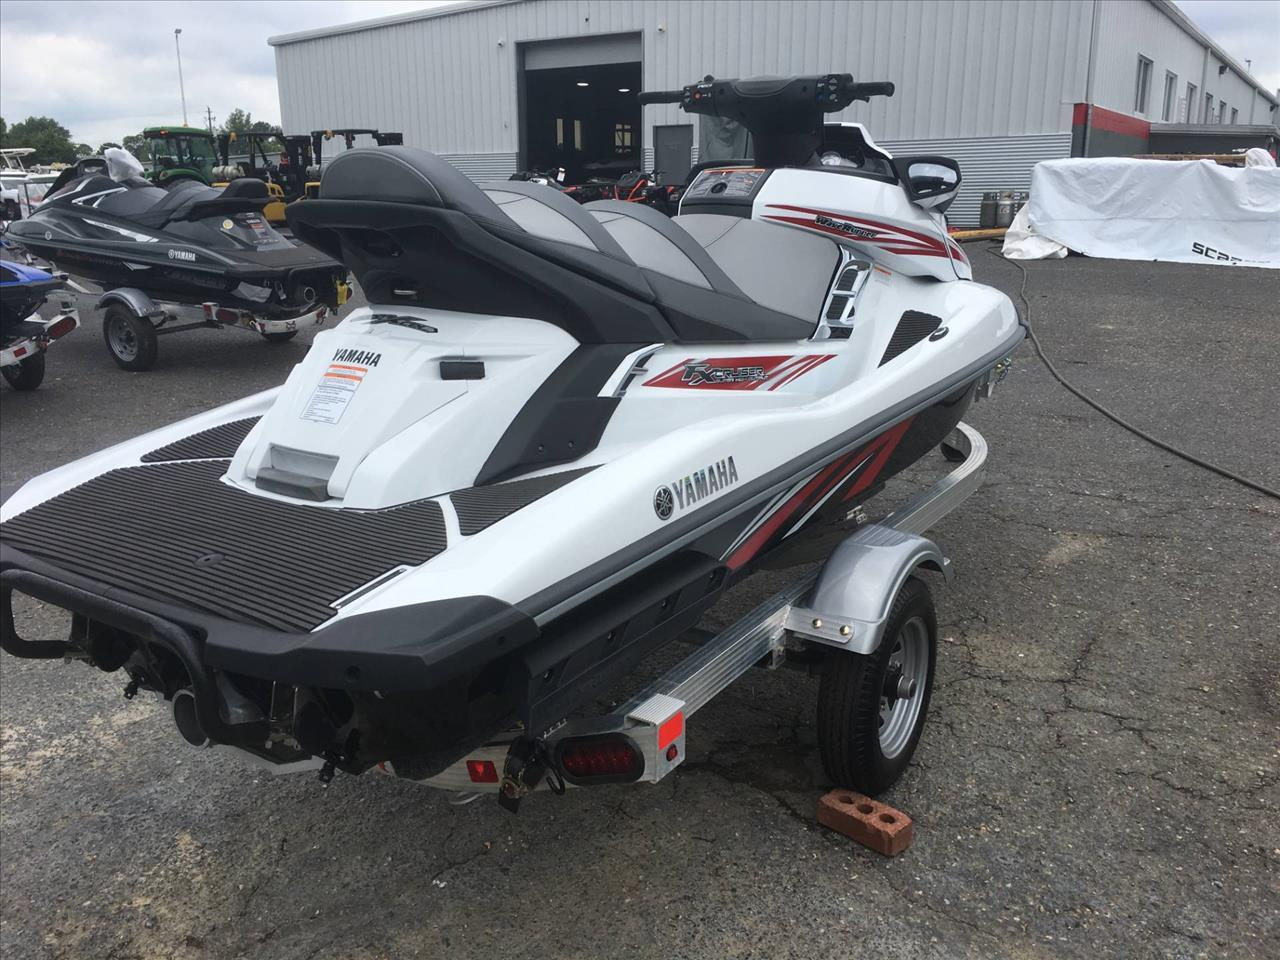 2016 Yamaha FX Cruiser SHO for sale at Vehicle Network, LLC - Performance East, INC. in Goldsboro NC